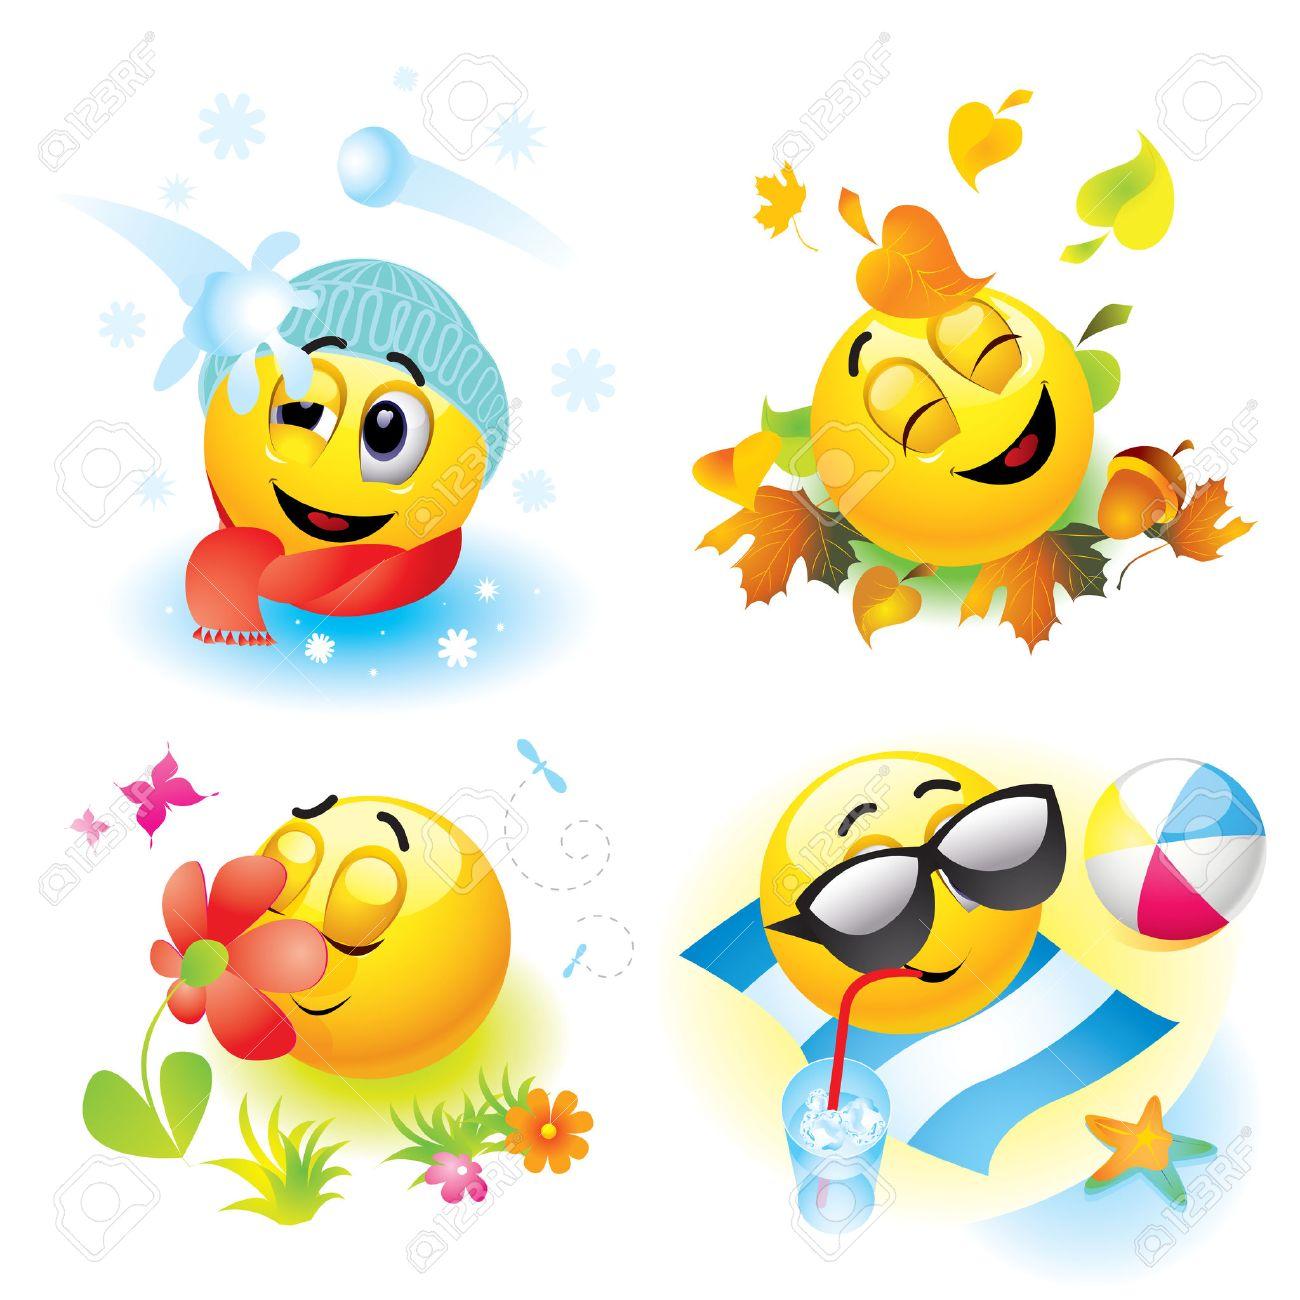 Smiley balls in different season Stock Vector - 5999976